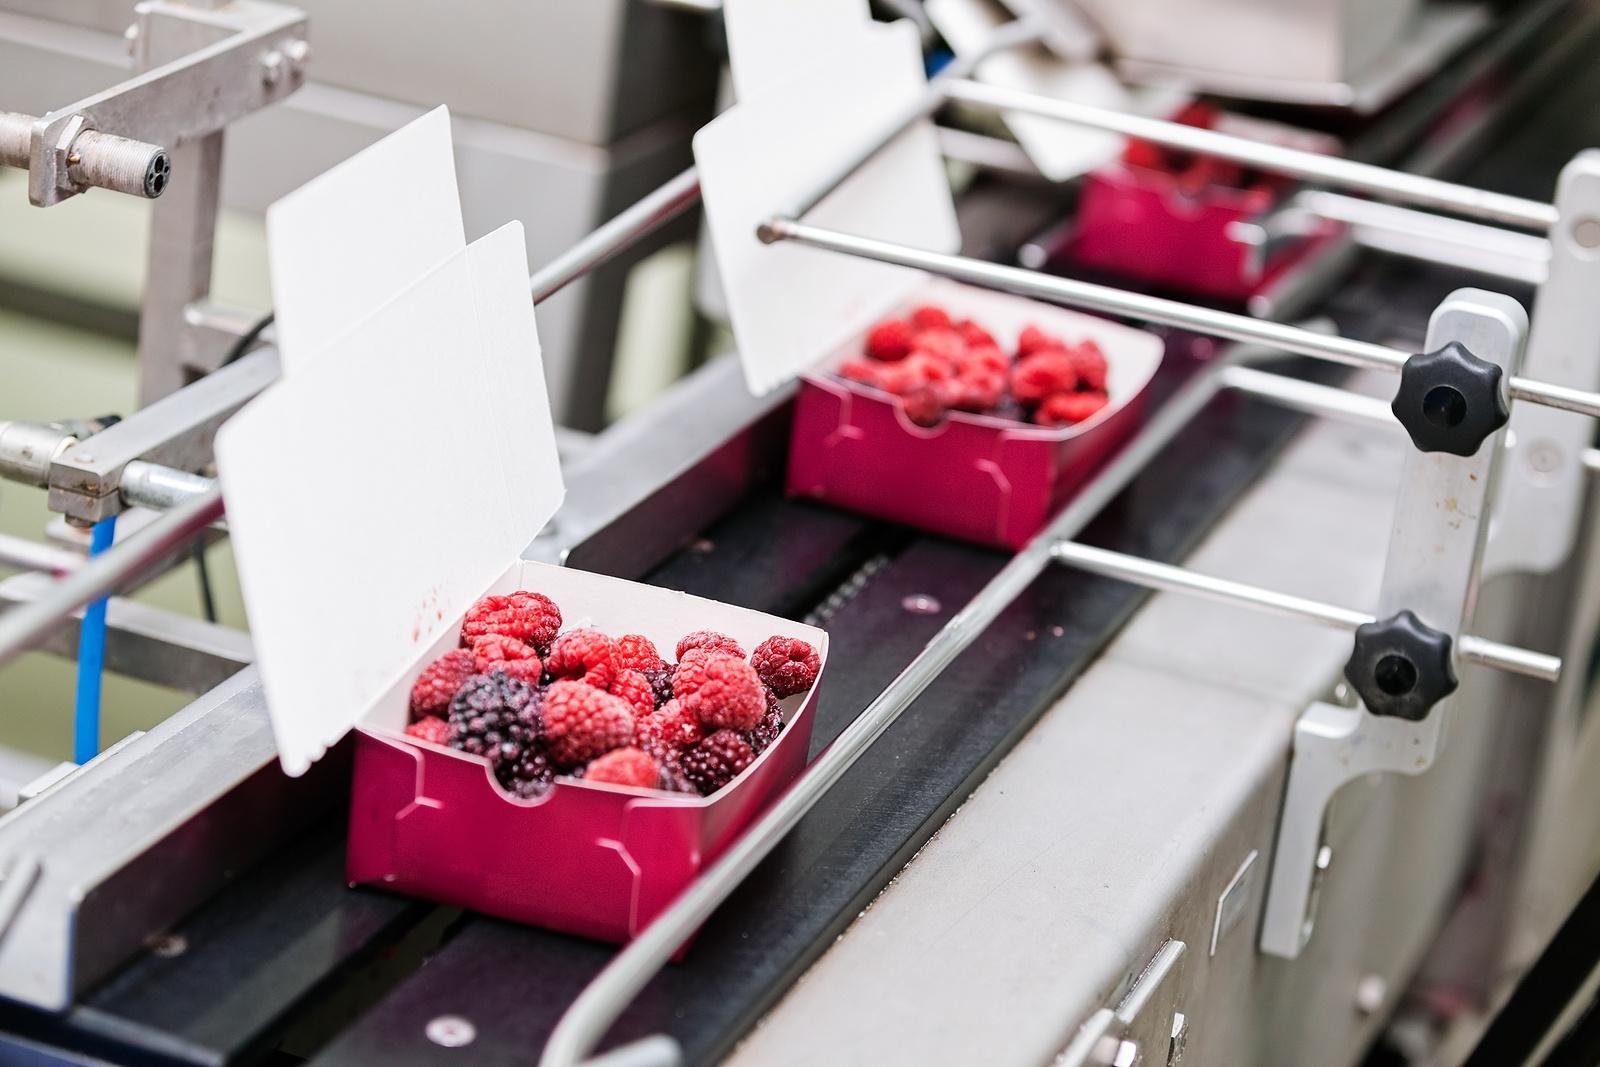 frozen raspberries being packaged